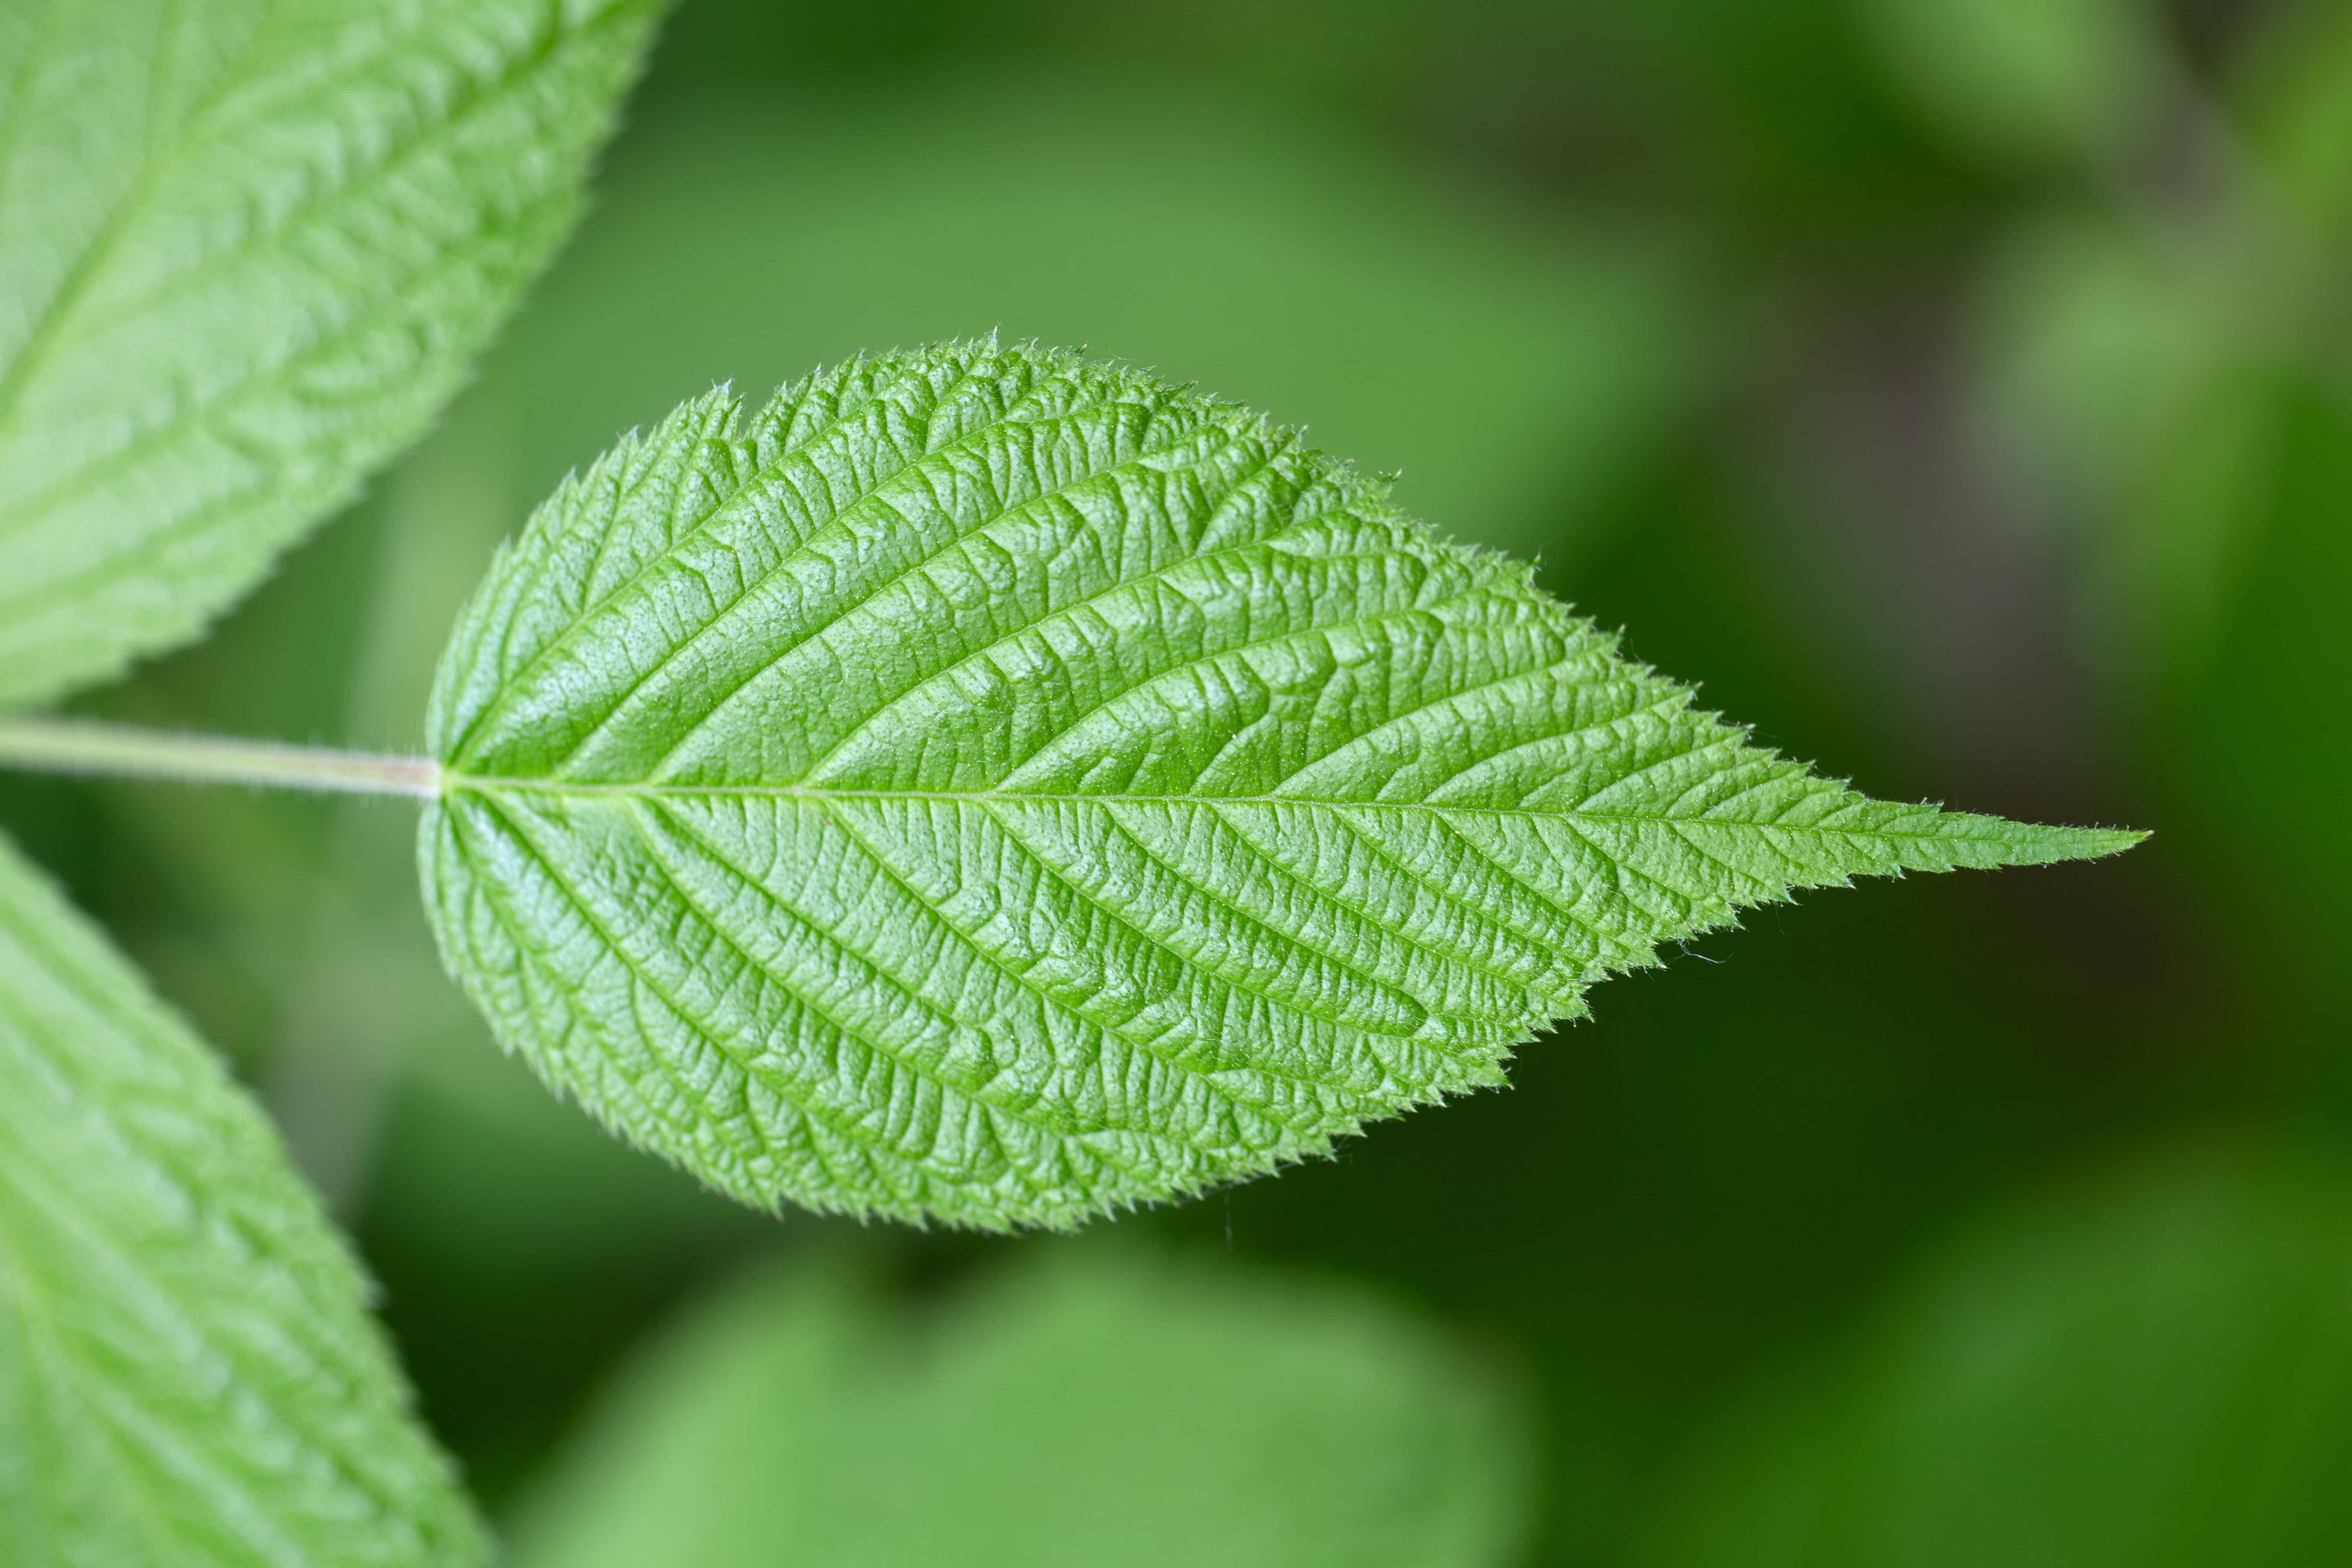 leaf leaves nature horizontal tree mint blurry herb kb if